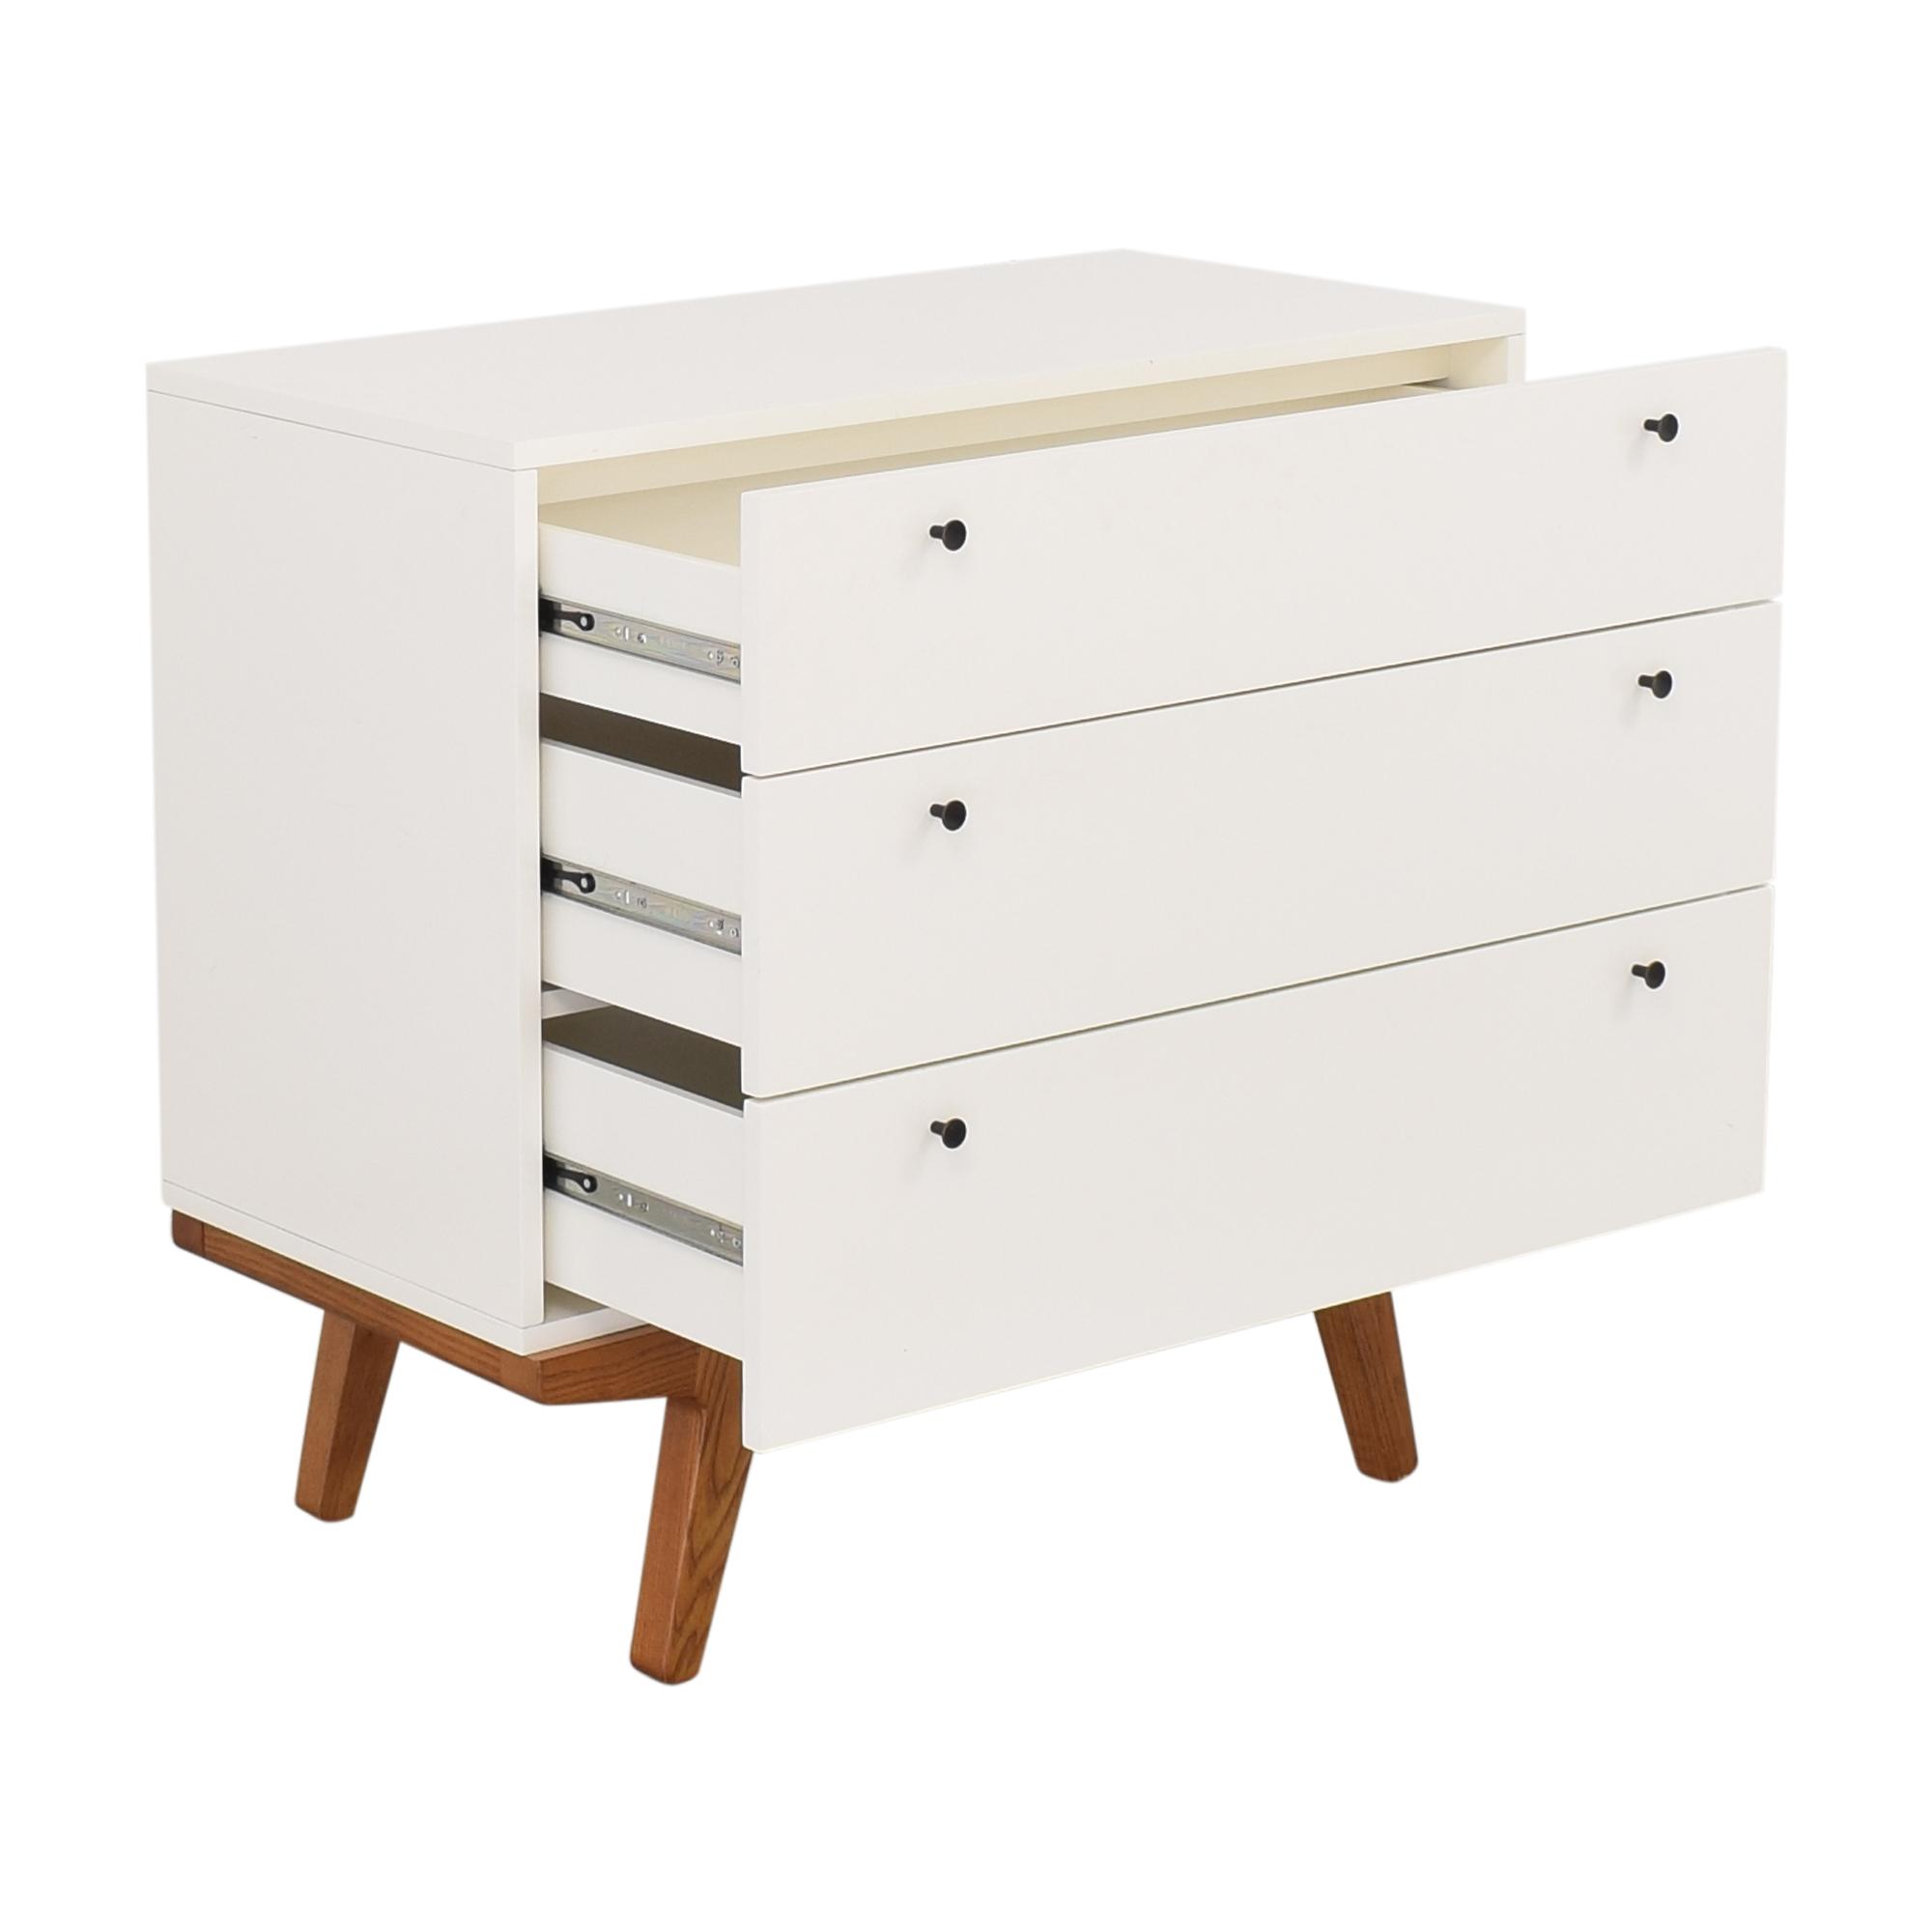 West Elm West Elm Modern 3 Drawer Dresser